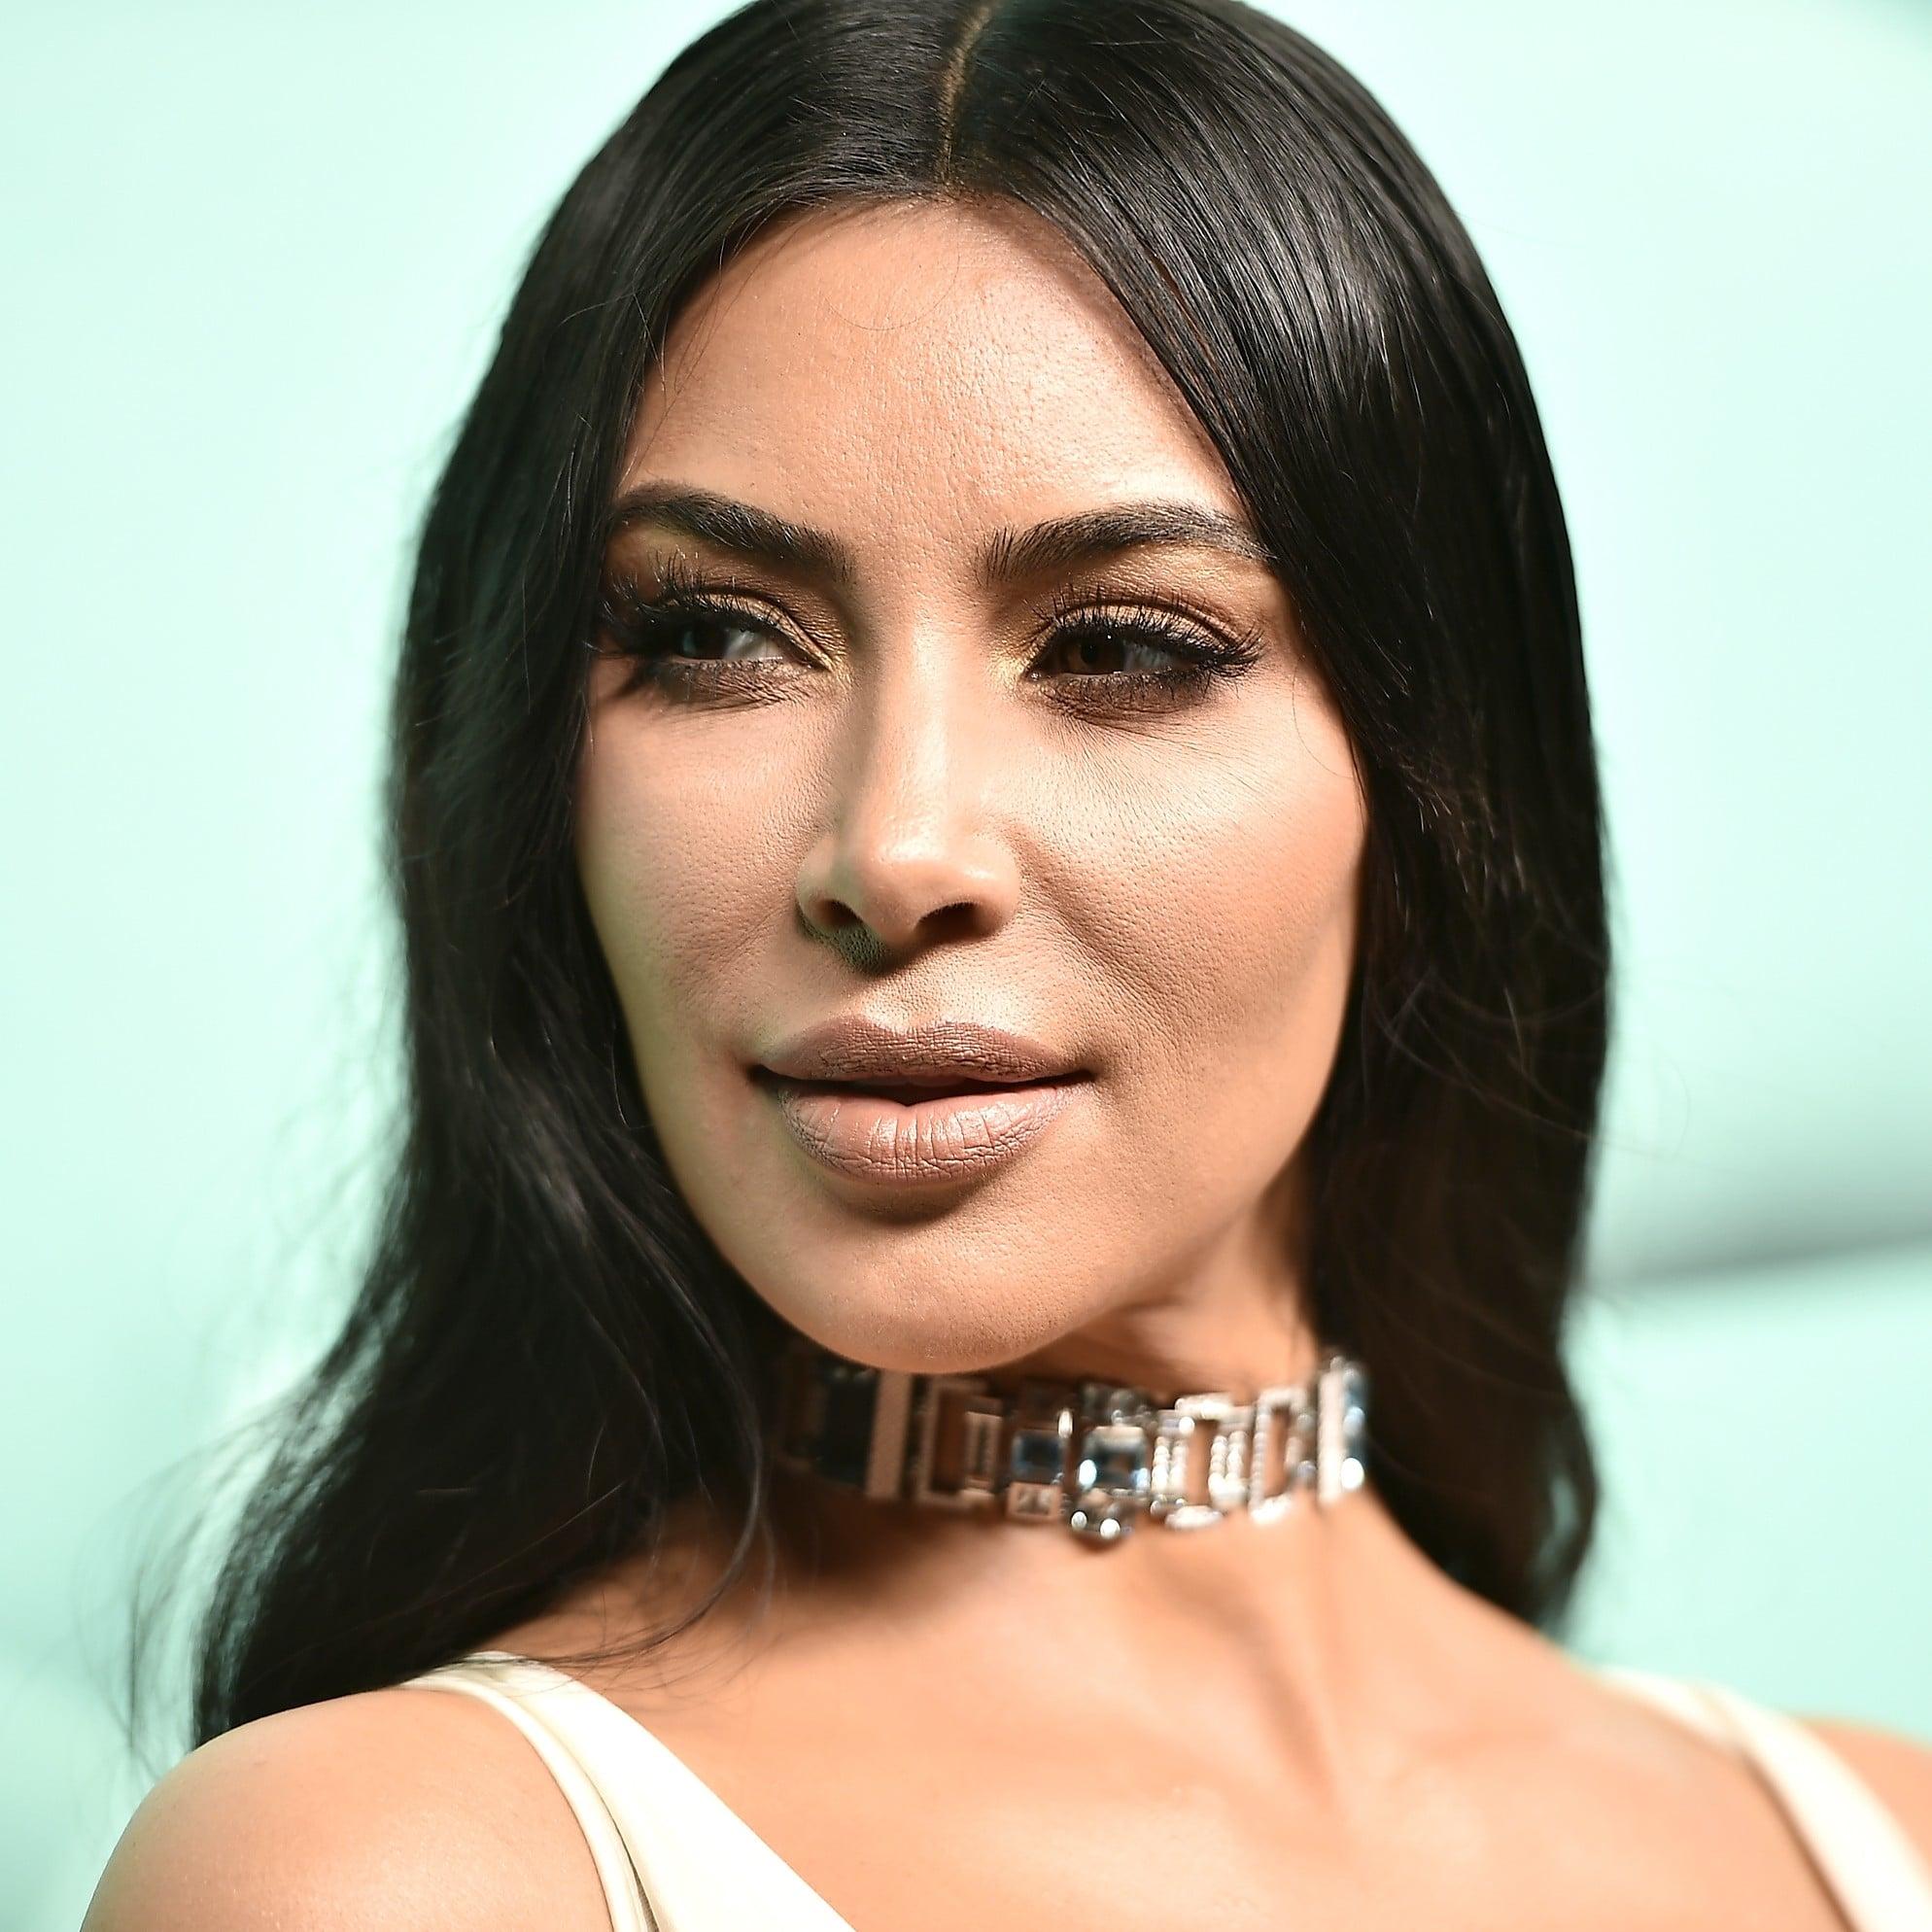 kim kardashian white dress and tiffany co choker 2018 popsugar